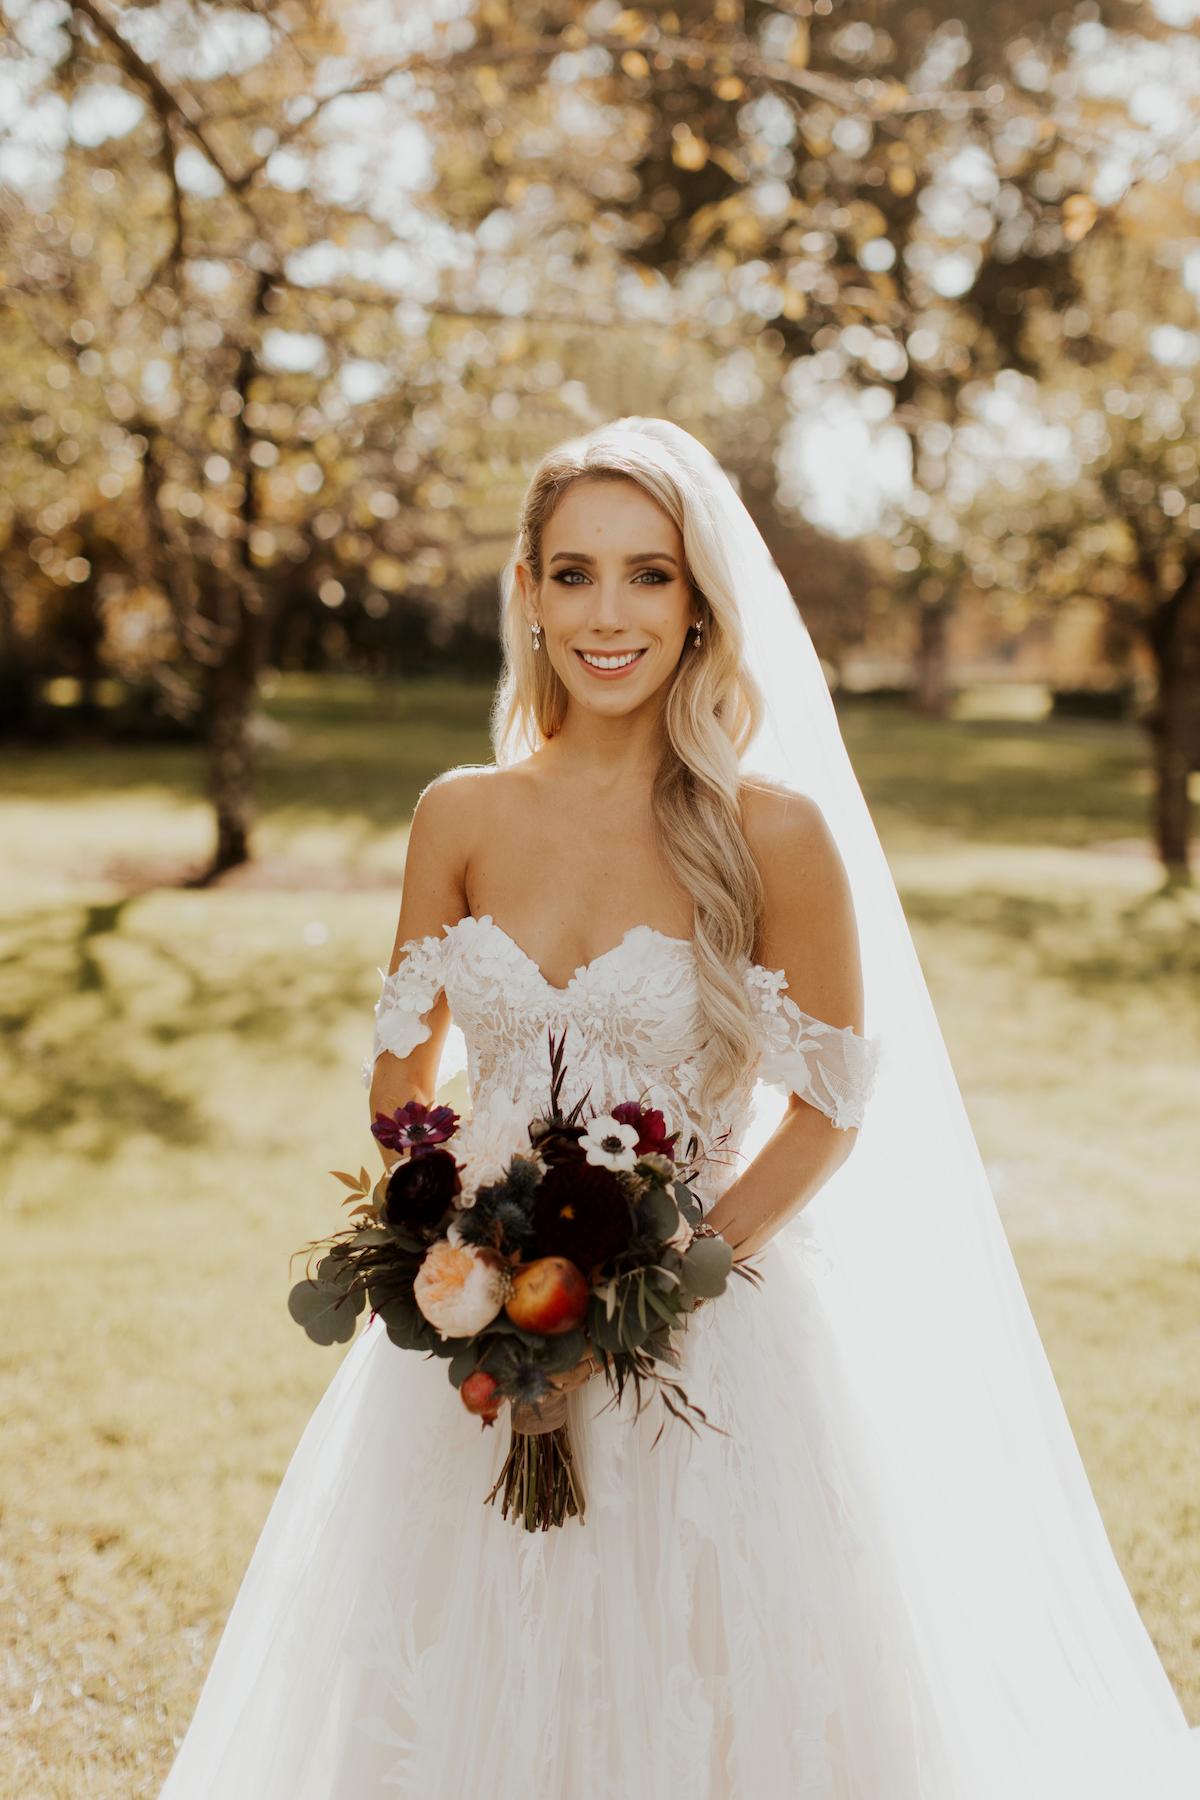 Katies Bliss Bridal Portrait Photos